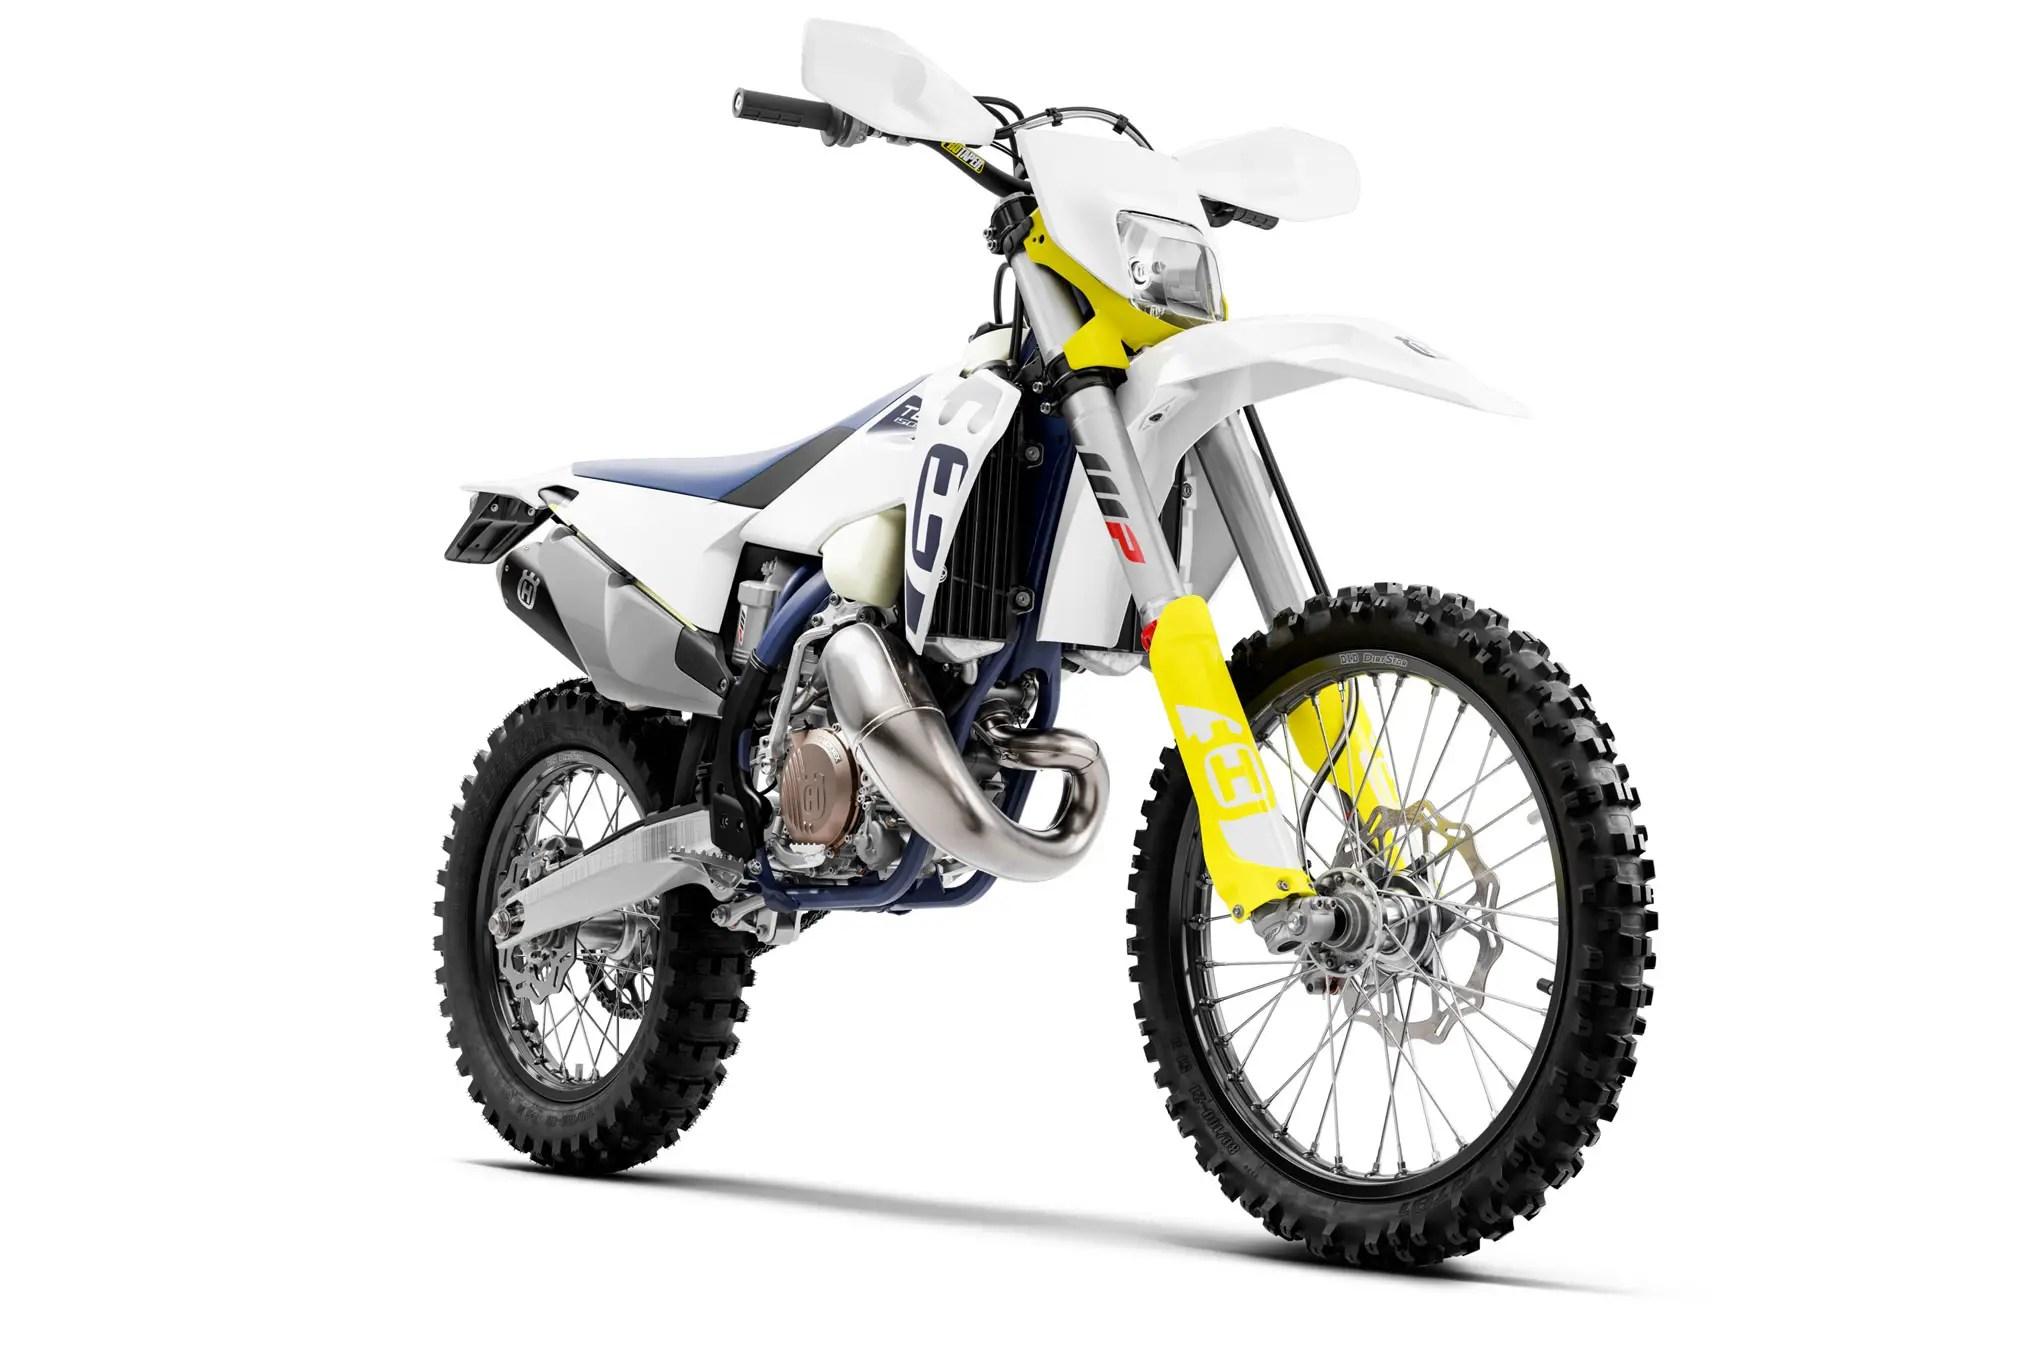 2020 Husqvarna TE150i Guide • Total Motorcycle